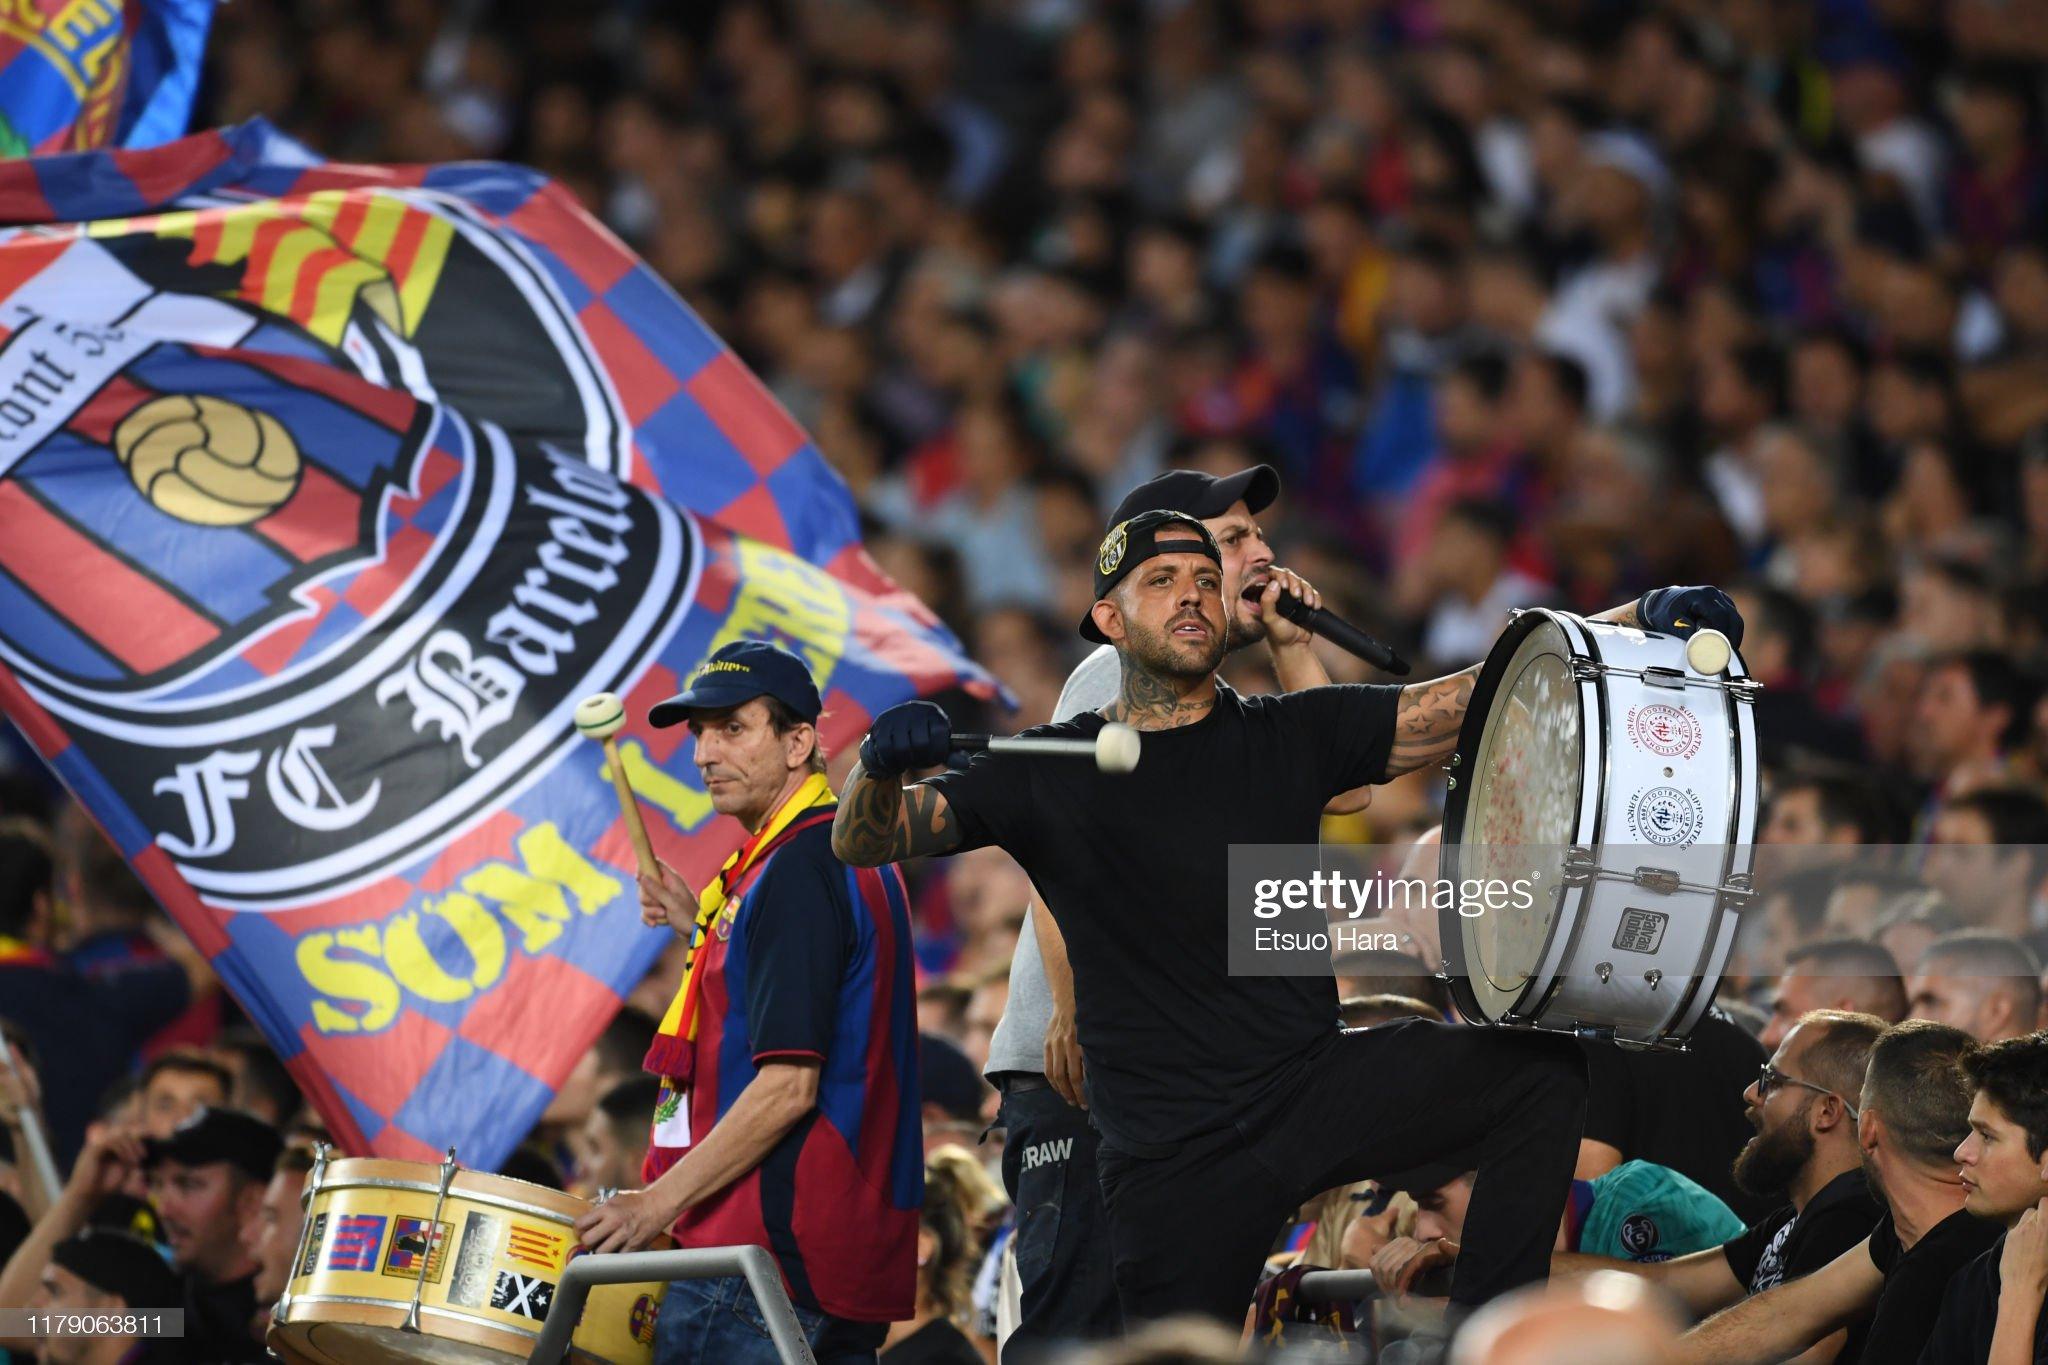 صور مباراة : برشلونة - إنتر 2-1 ( 02-10-2019 )  Fans-of-fc-barcelona-cheer-during-the-uefa-champions-league-group-f-picture-id1179063811?s=2048x2048